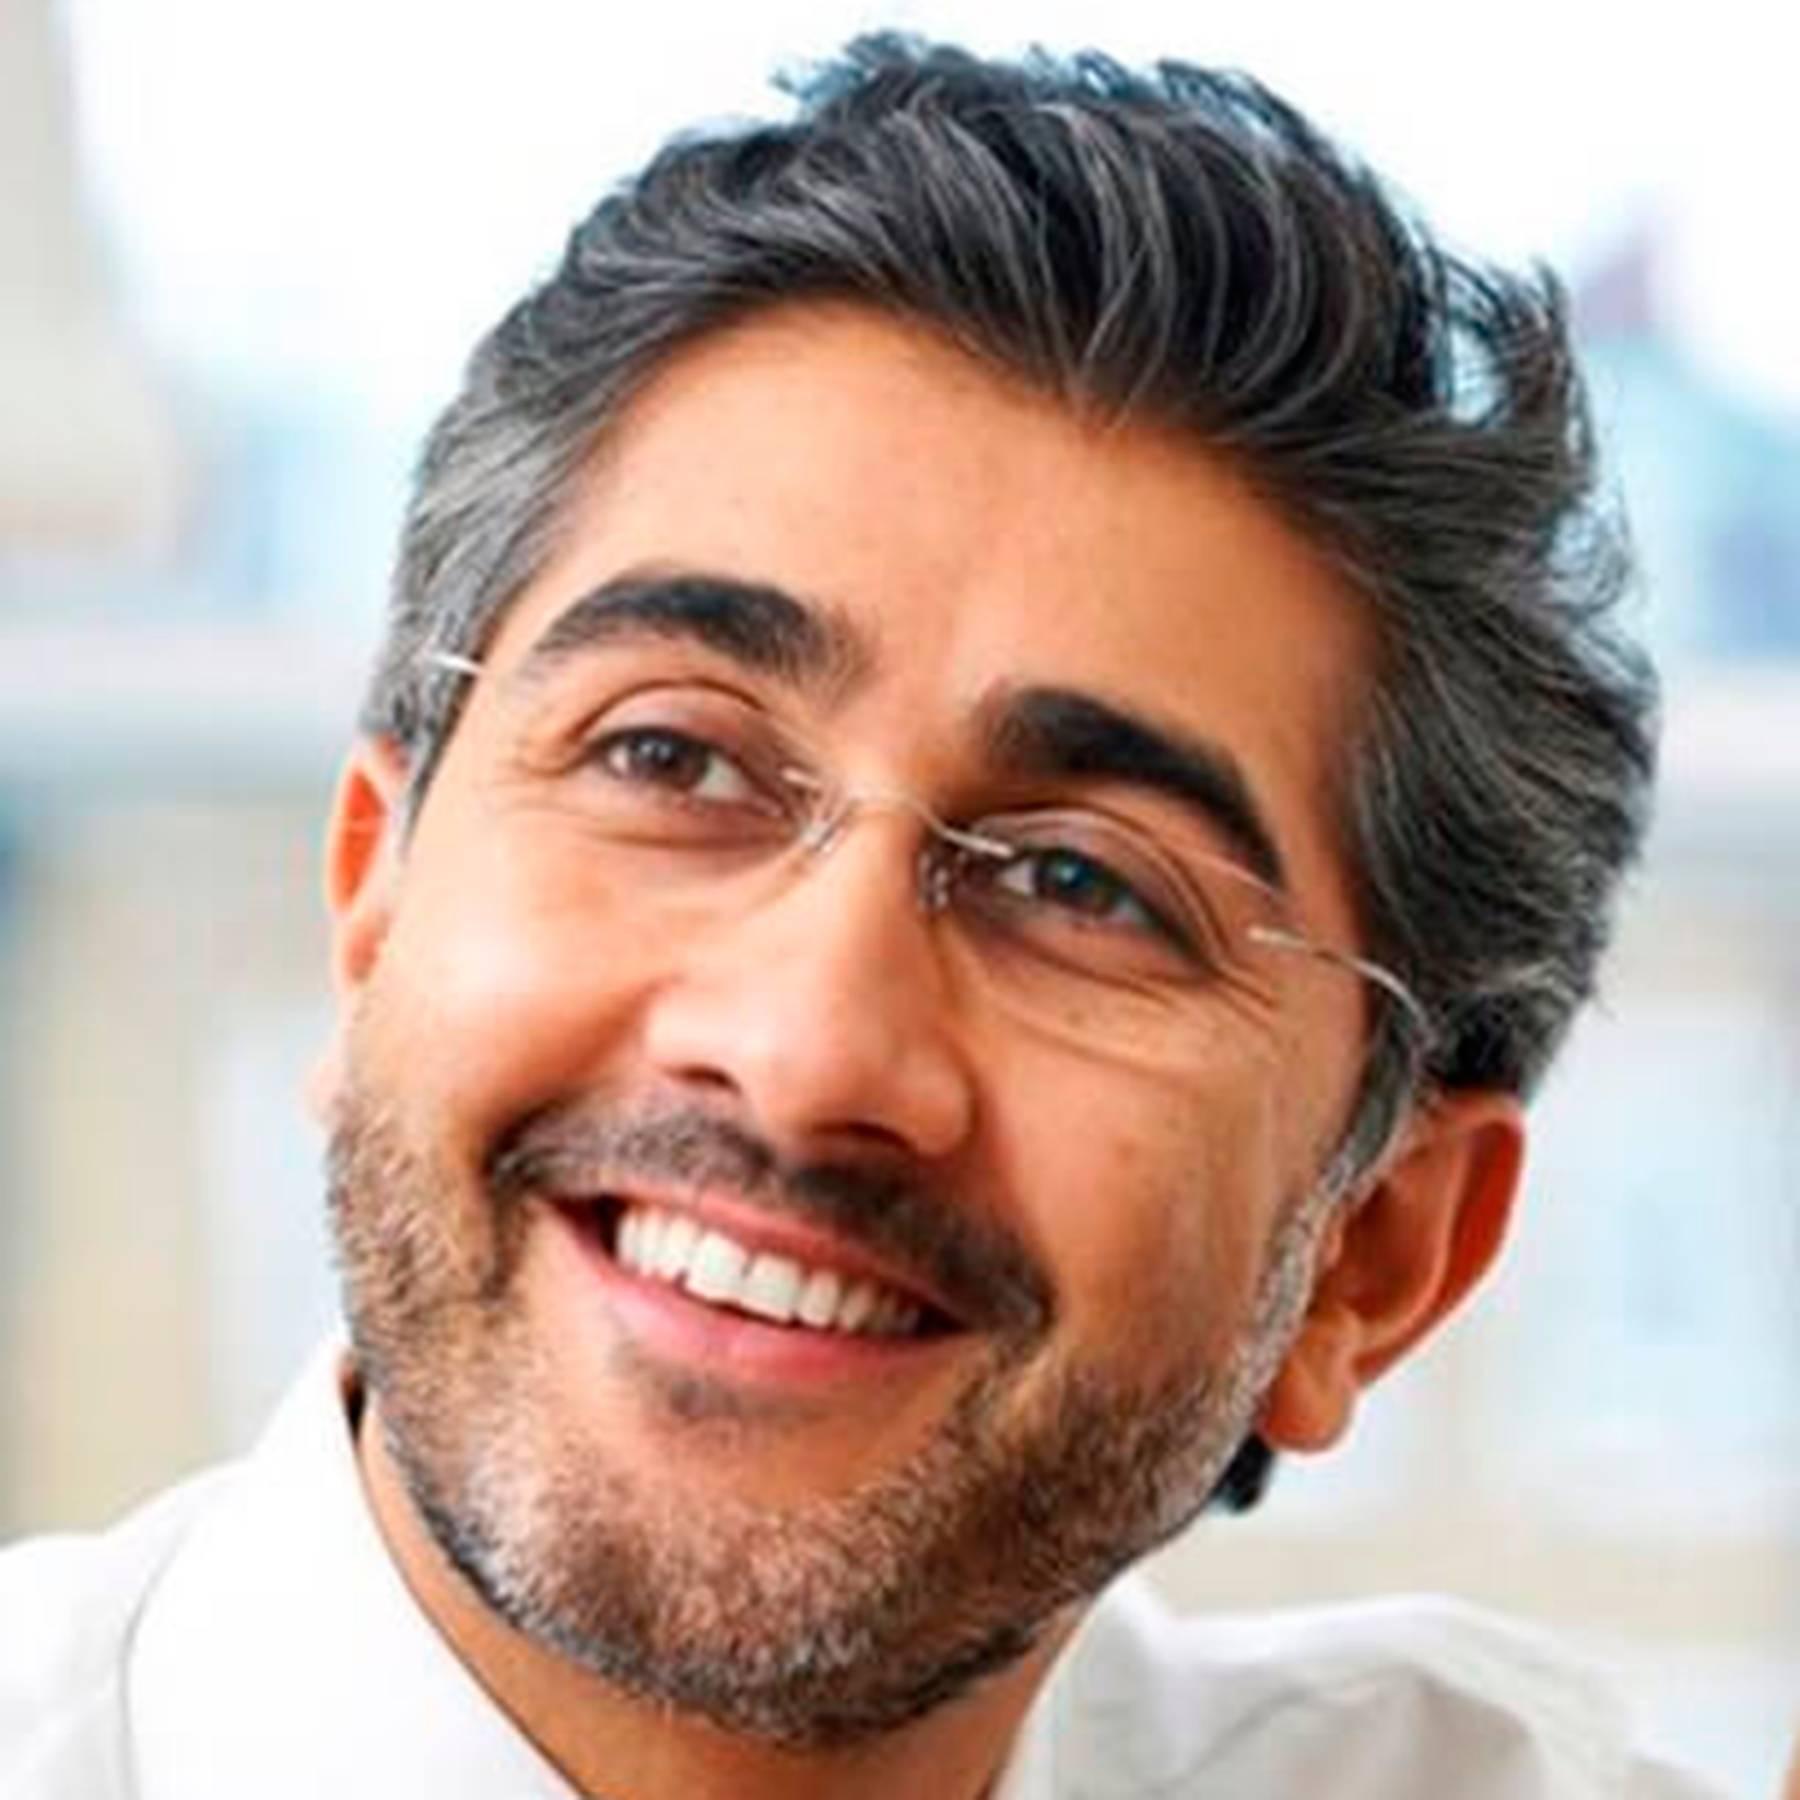 Dentist London: Dr Sameer Patel | Tatler